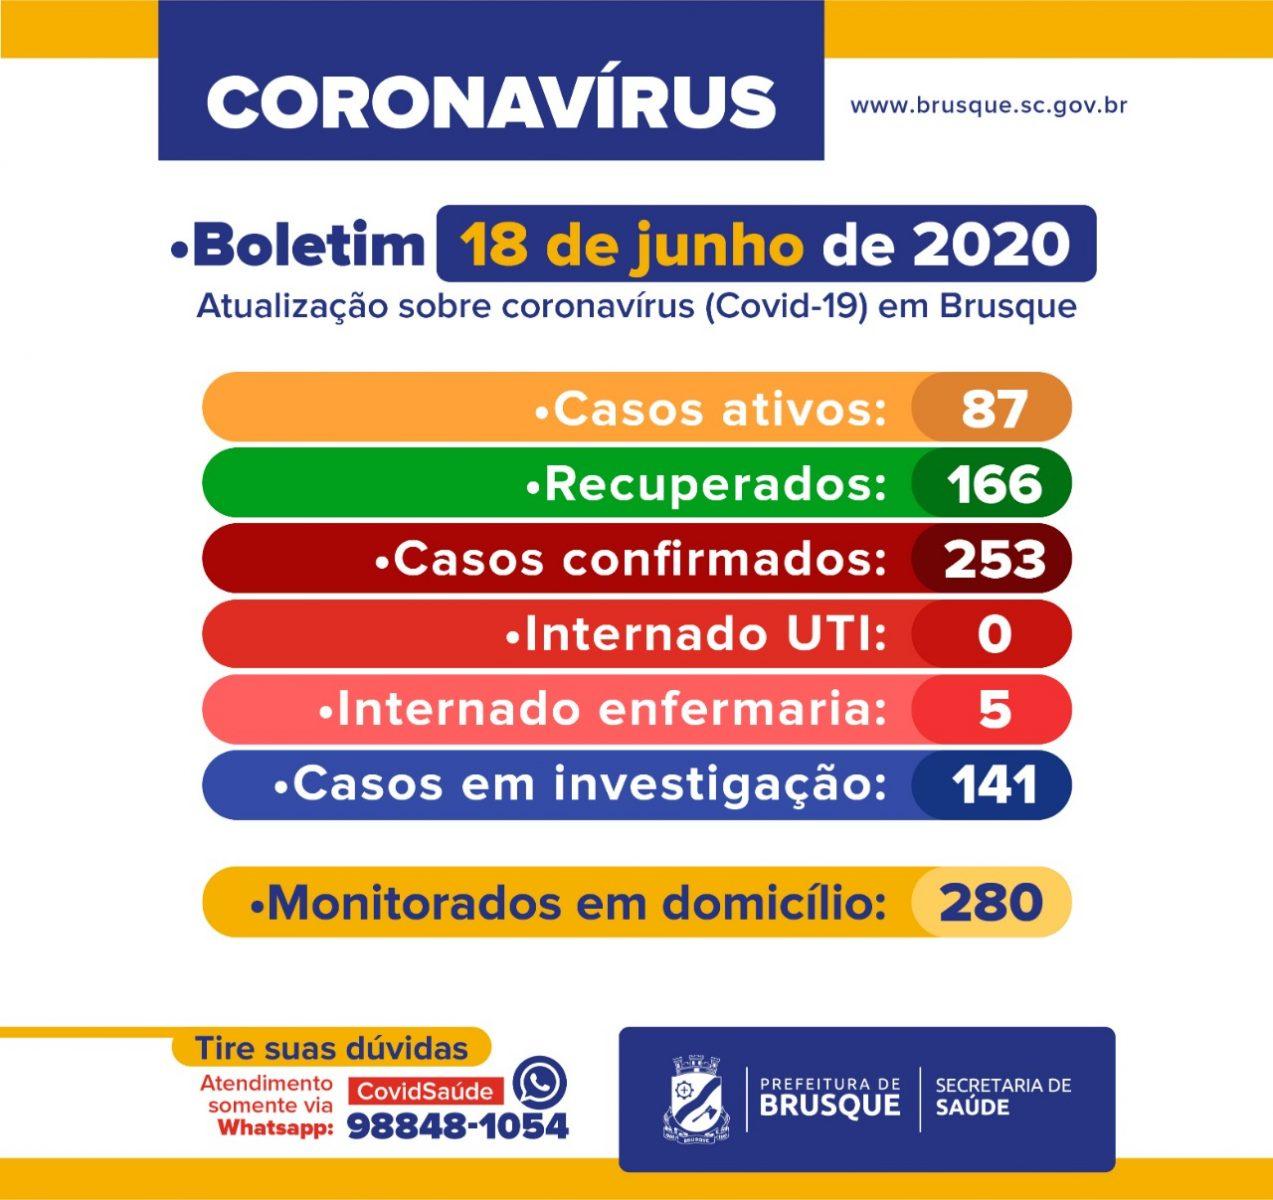 Confira o Boletim Epidemiológico da Prefeitura de Brusque desta quinta-feira (18)